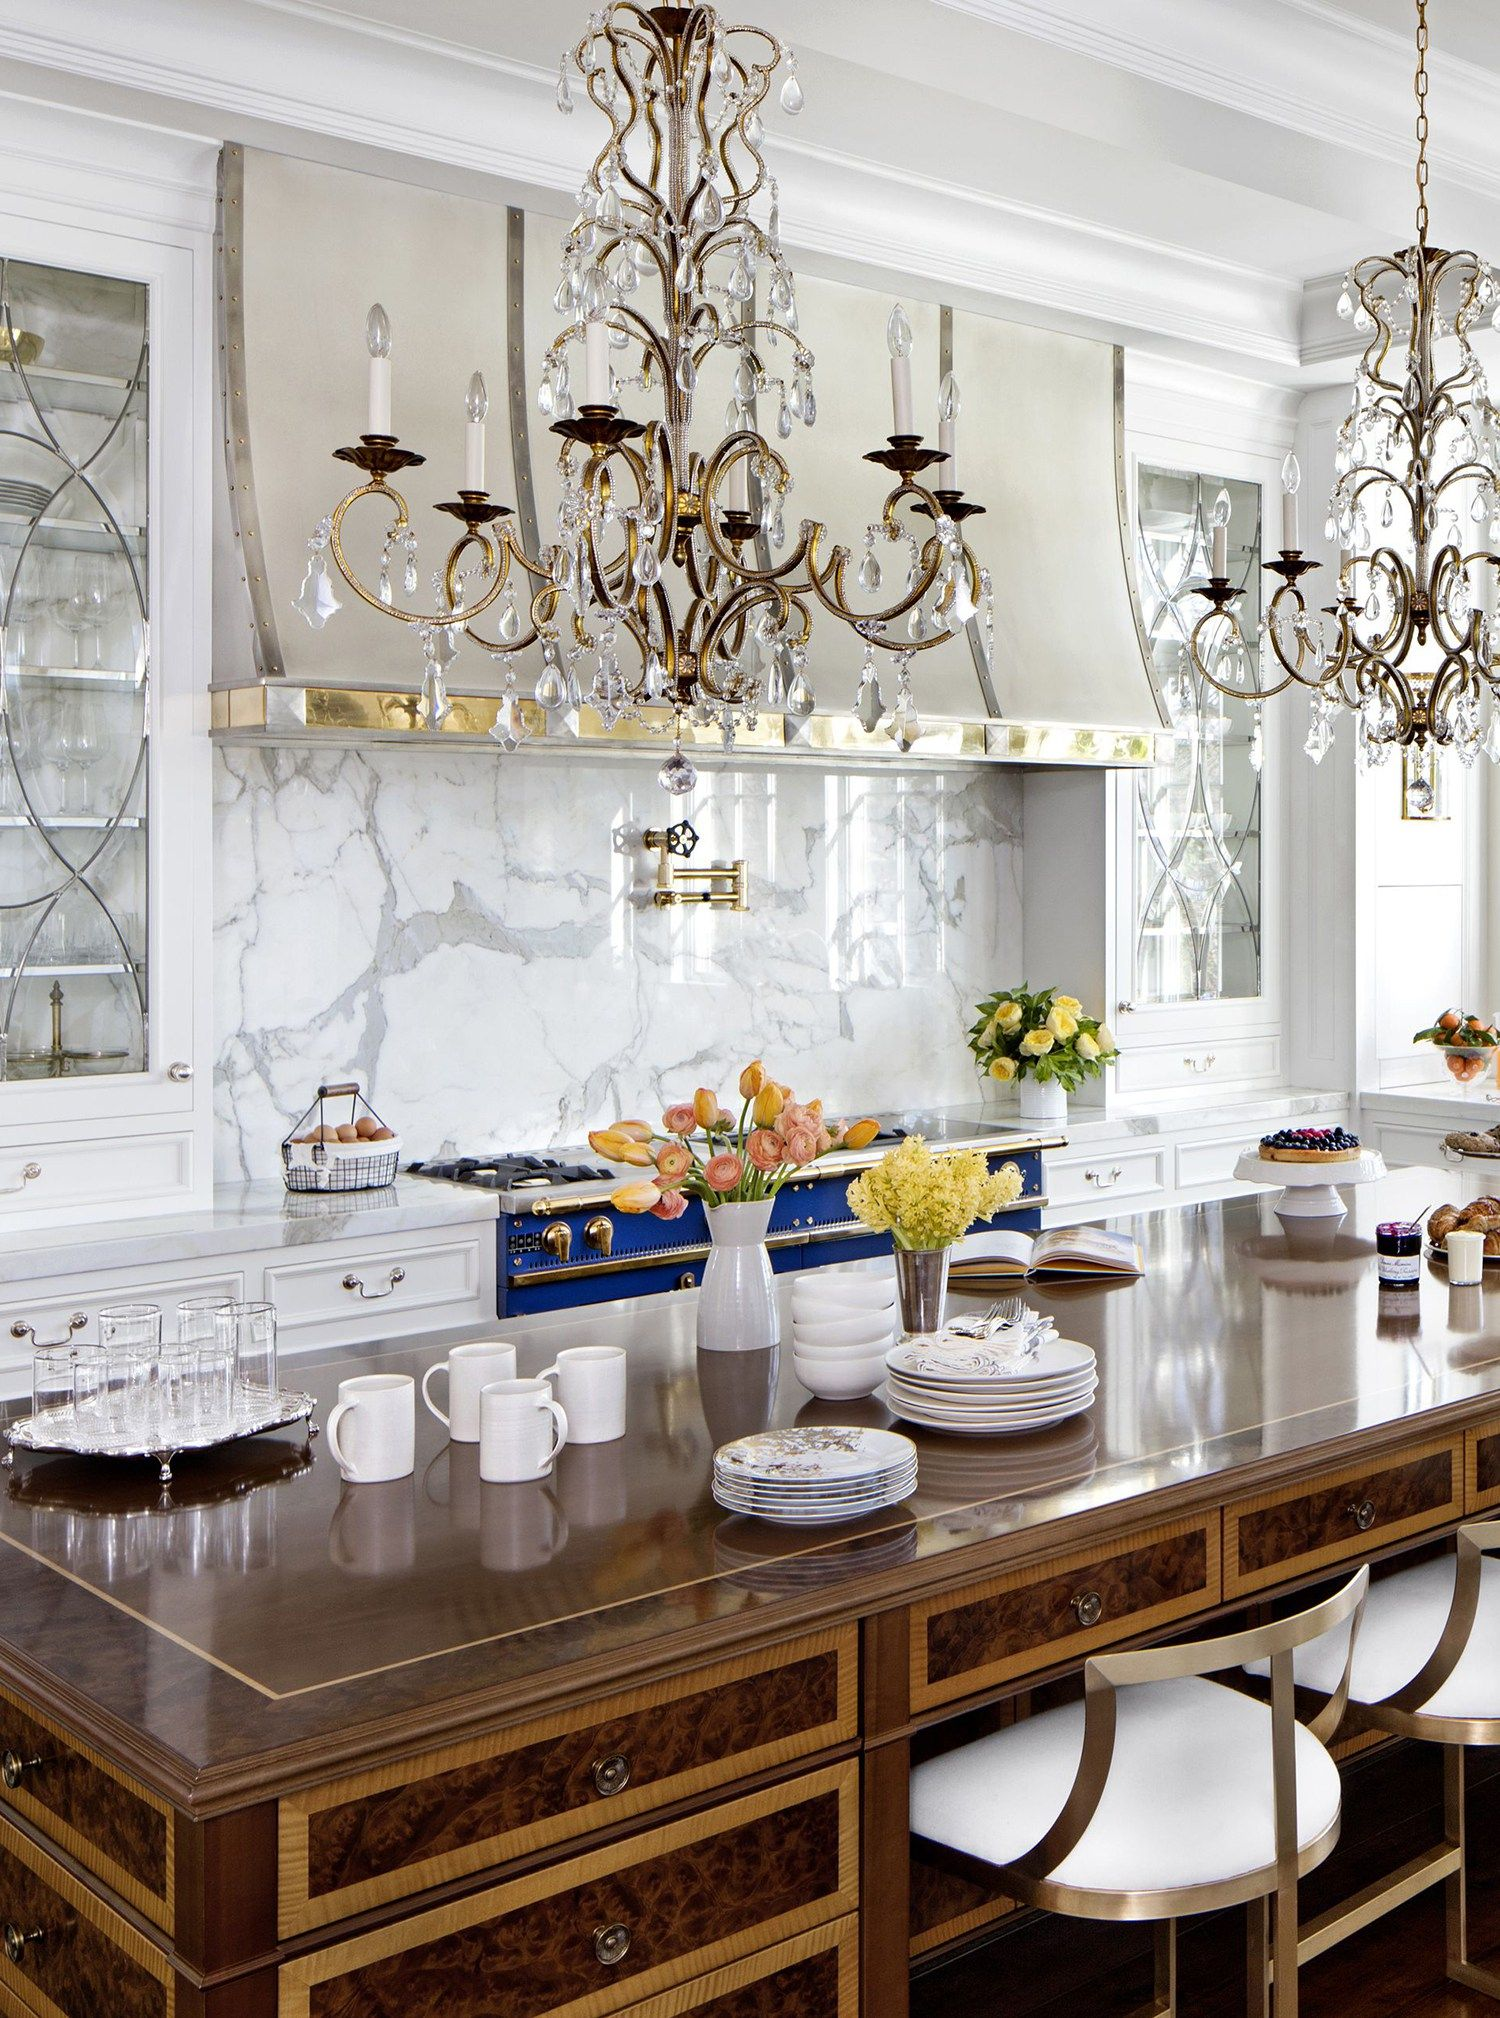 elegant kitchen ideas in 2020 elegant kitchens kitchen design fancy kitchens on e kitchen ideas id=60455